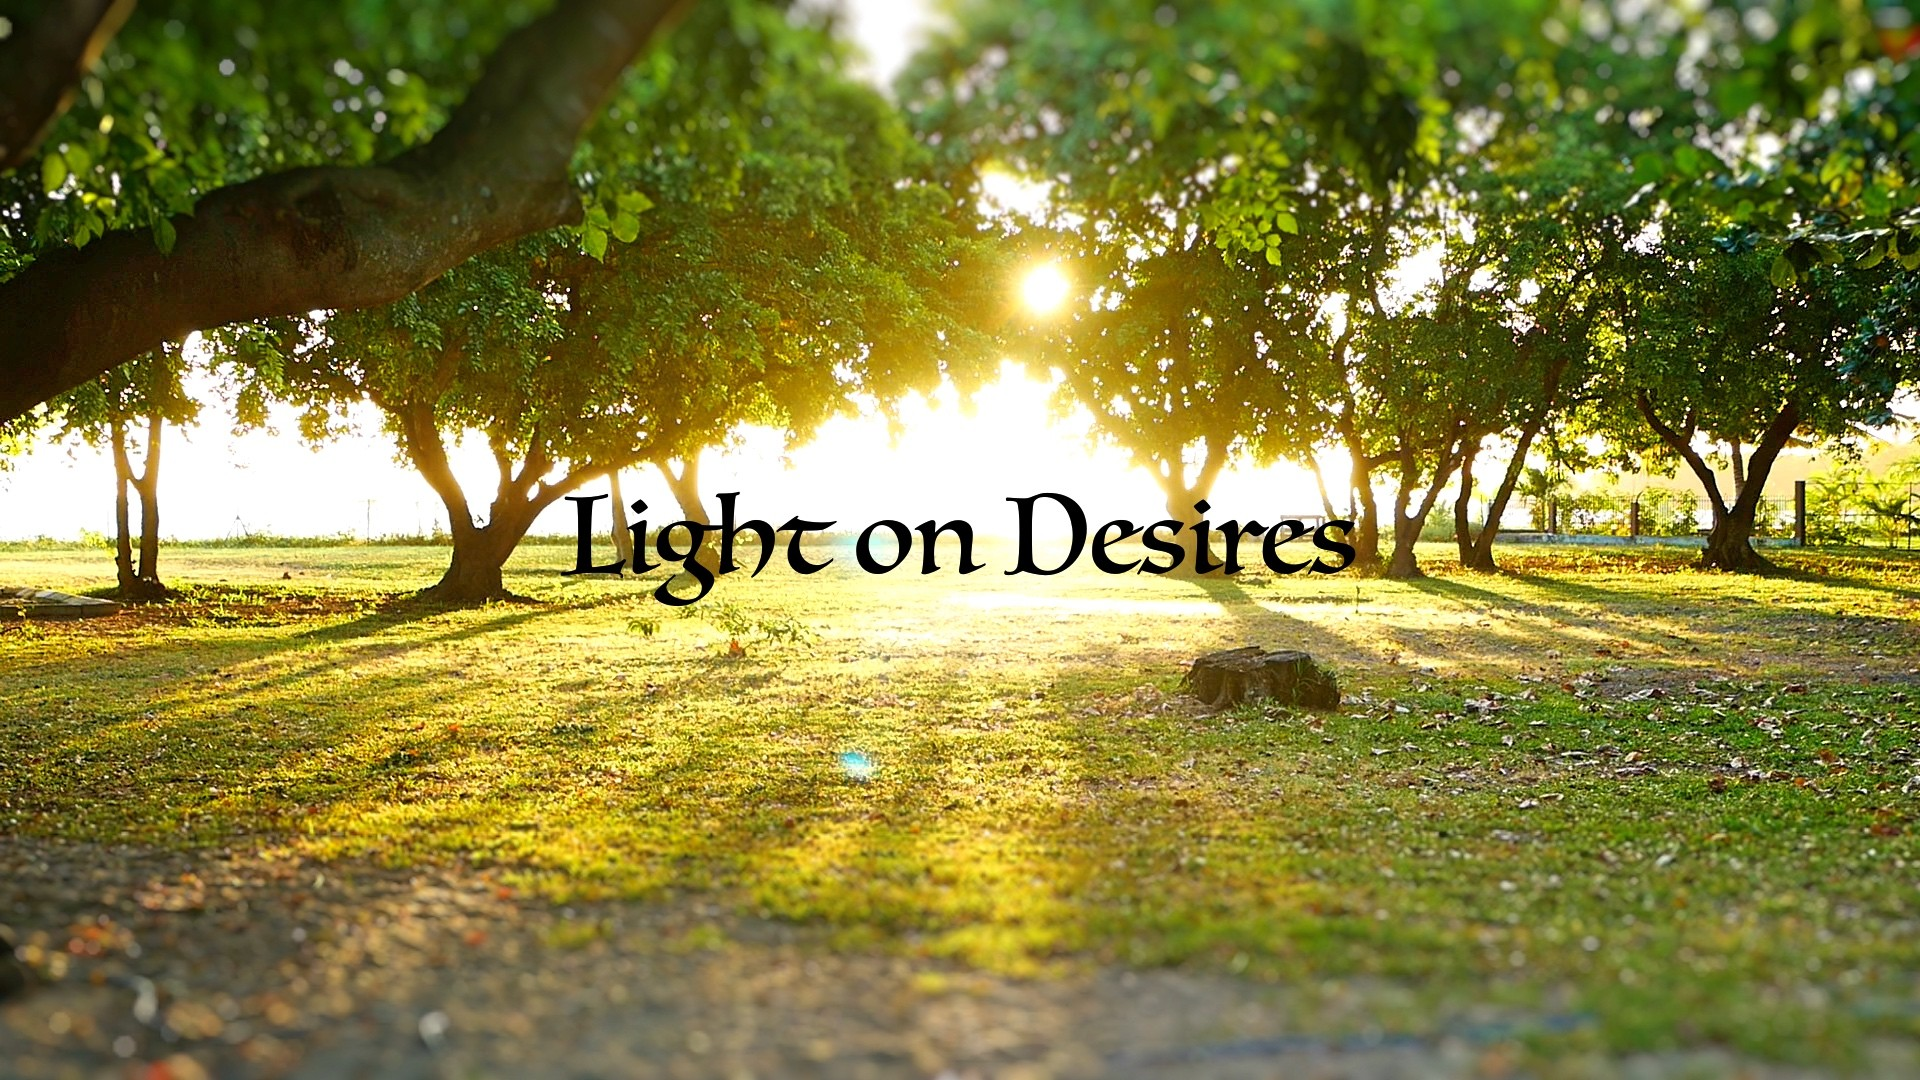 Light on Desires